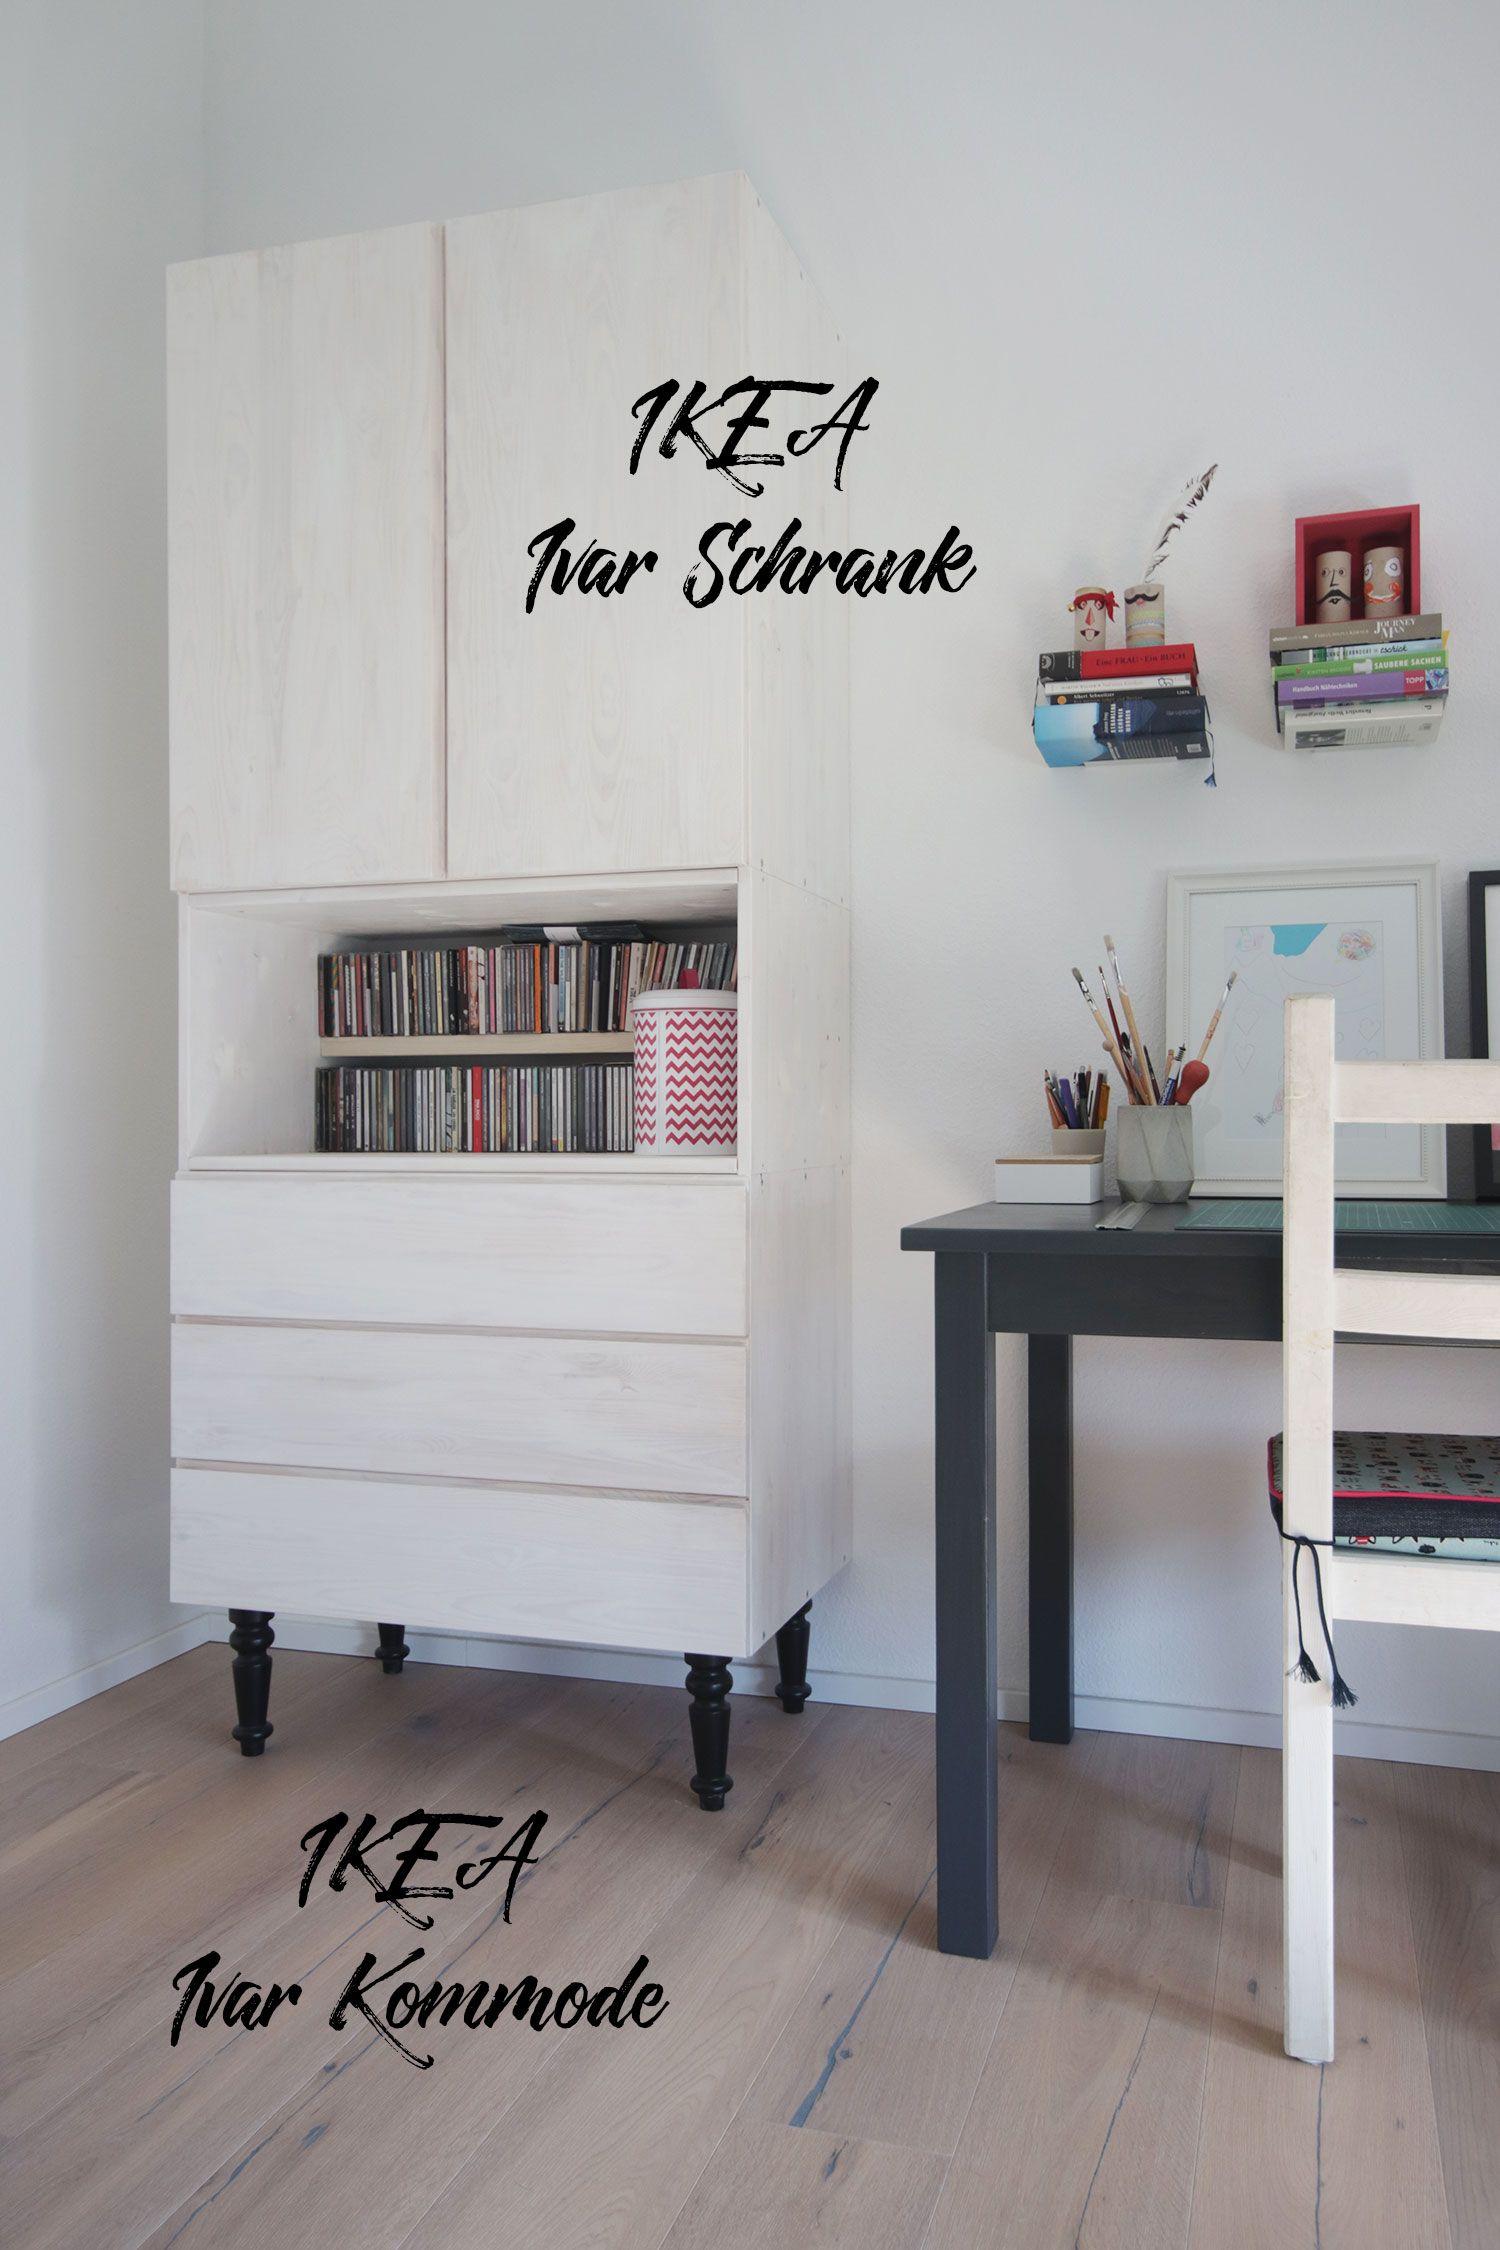 Ivar Hack Ivar Schrank Ikea Ivar Schrank